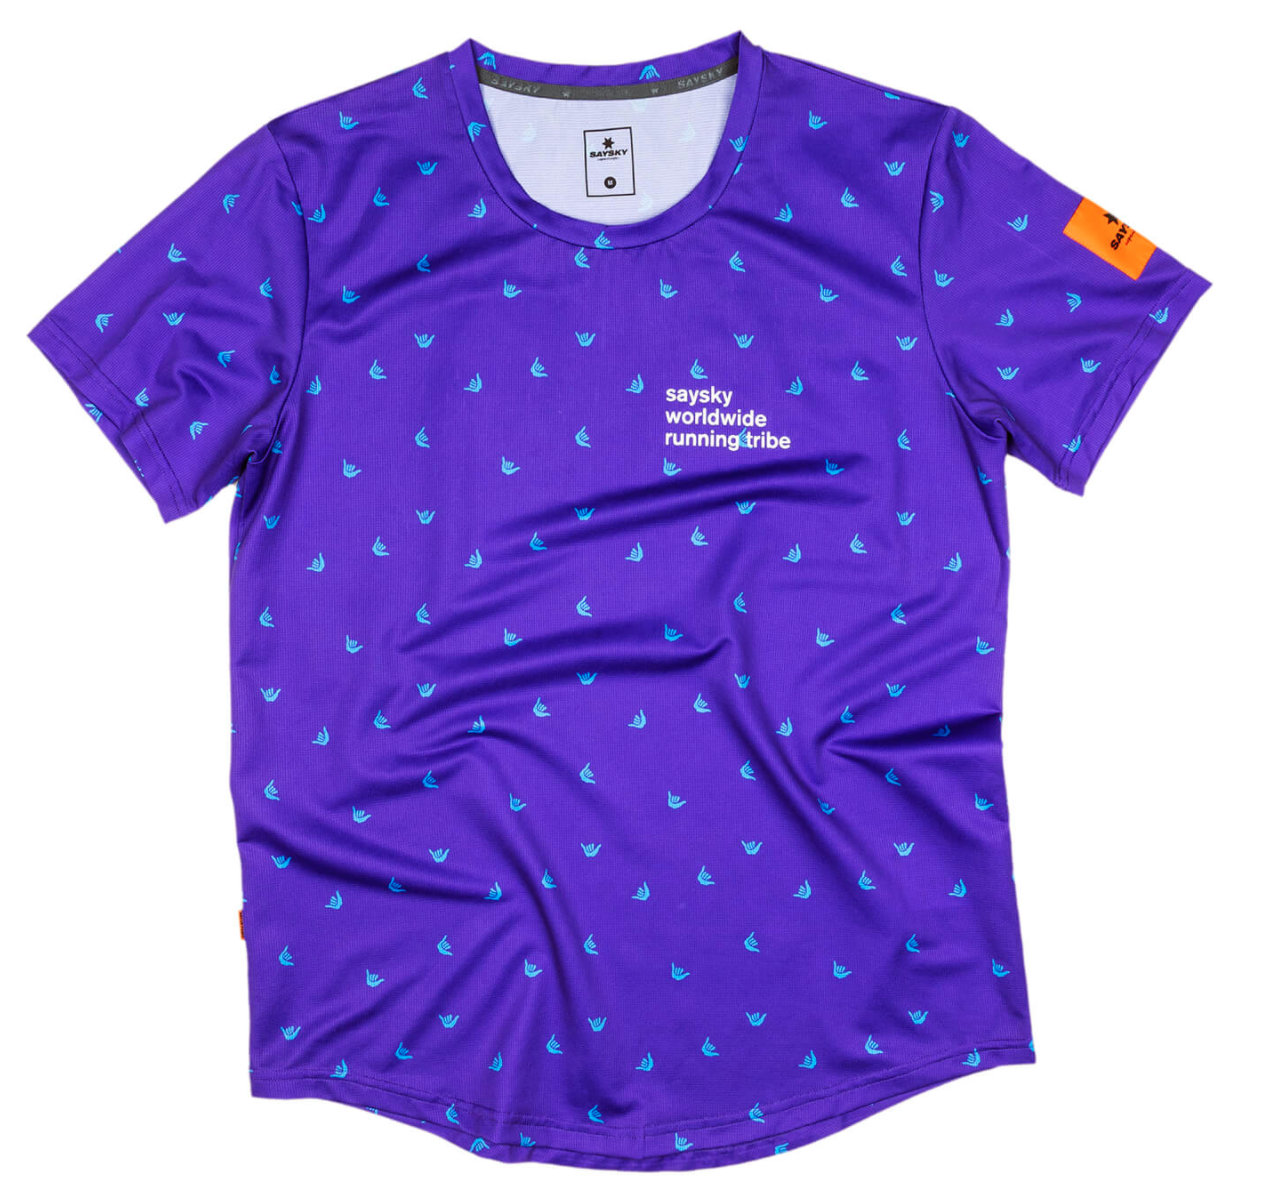 【10%OFF】SAYSKY ランニングTシャツ Shaka Combat Tee - PURPLE SHAKA PRINT [ユニセックス] FMRSS16